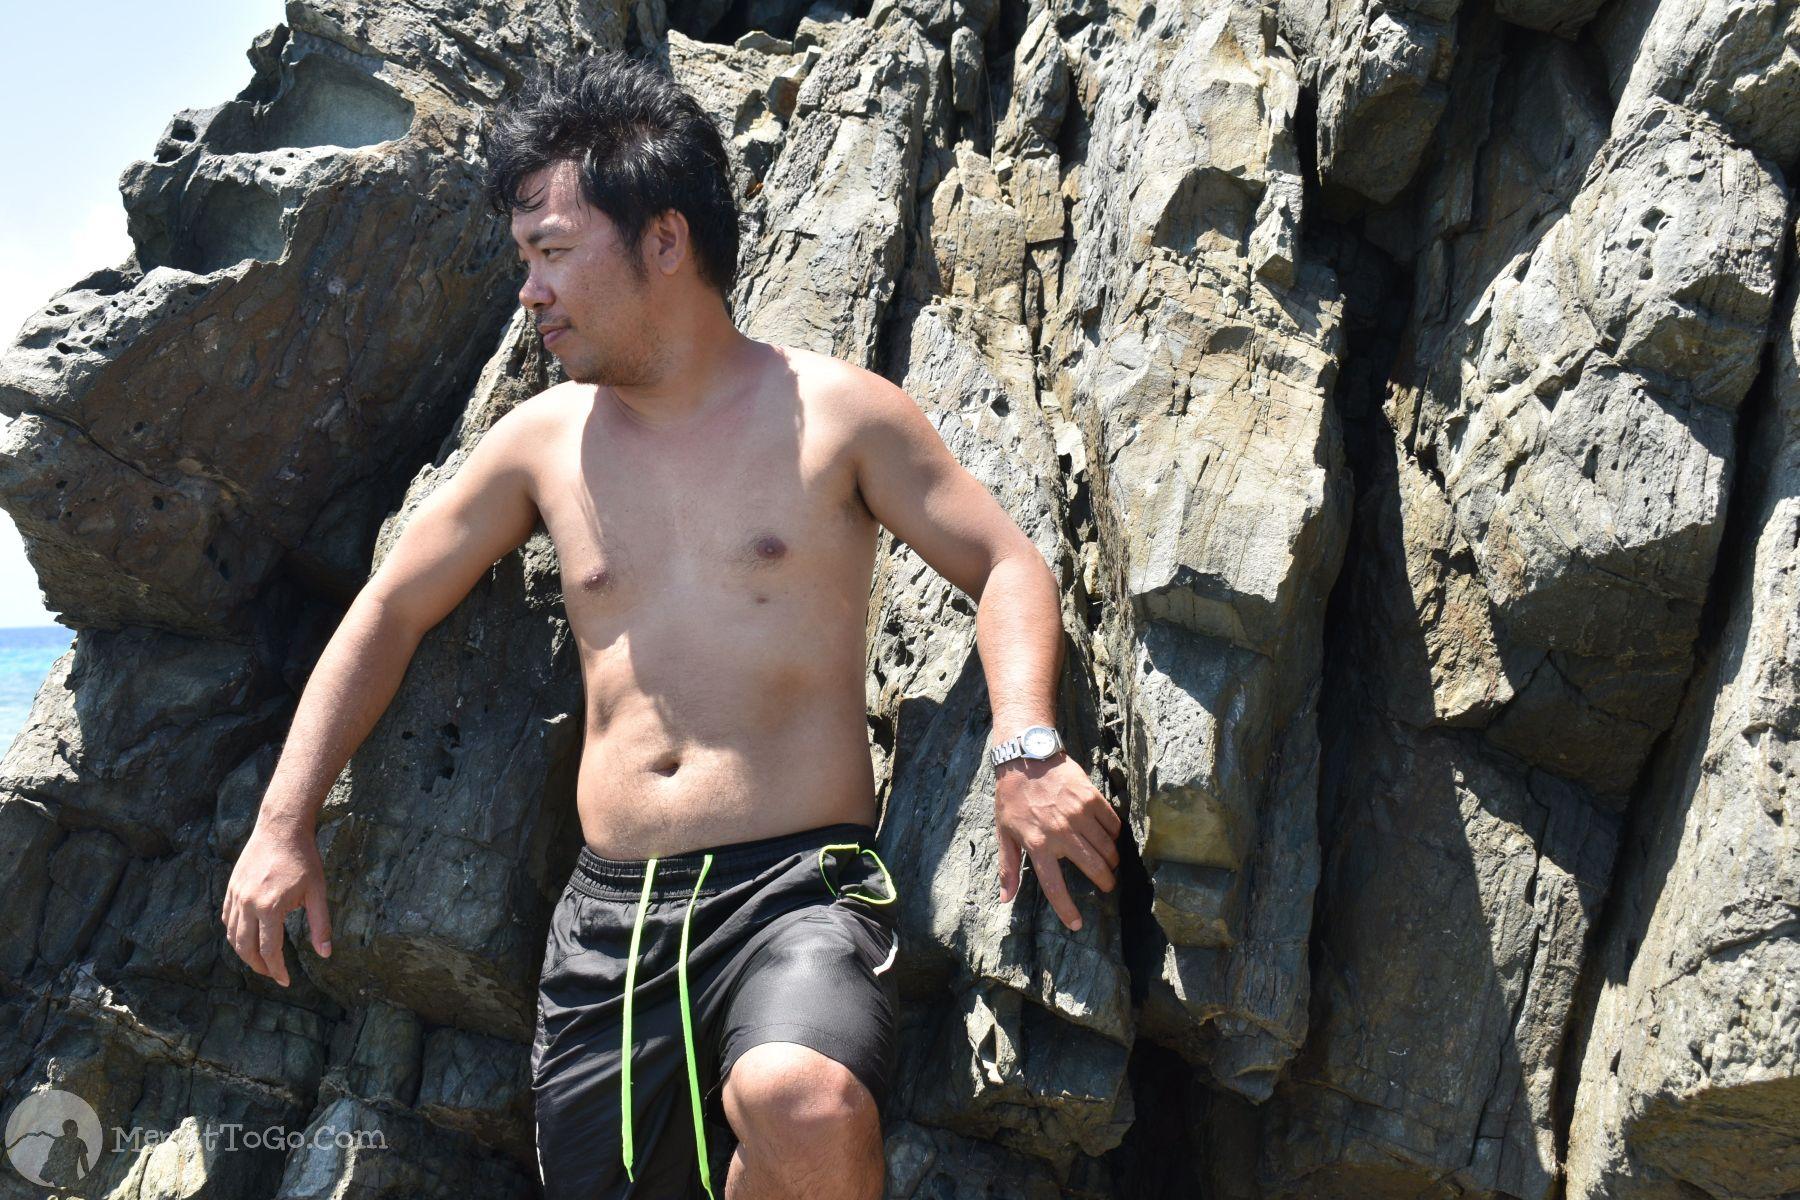 Rock formations at Wanniban Island, Mati, Davao Oriental